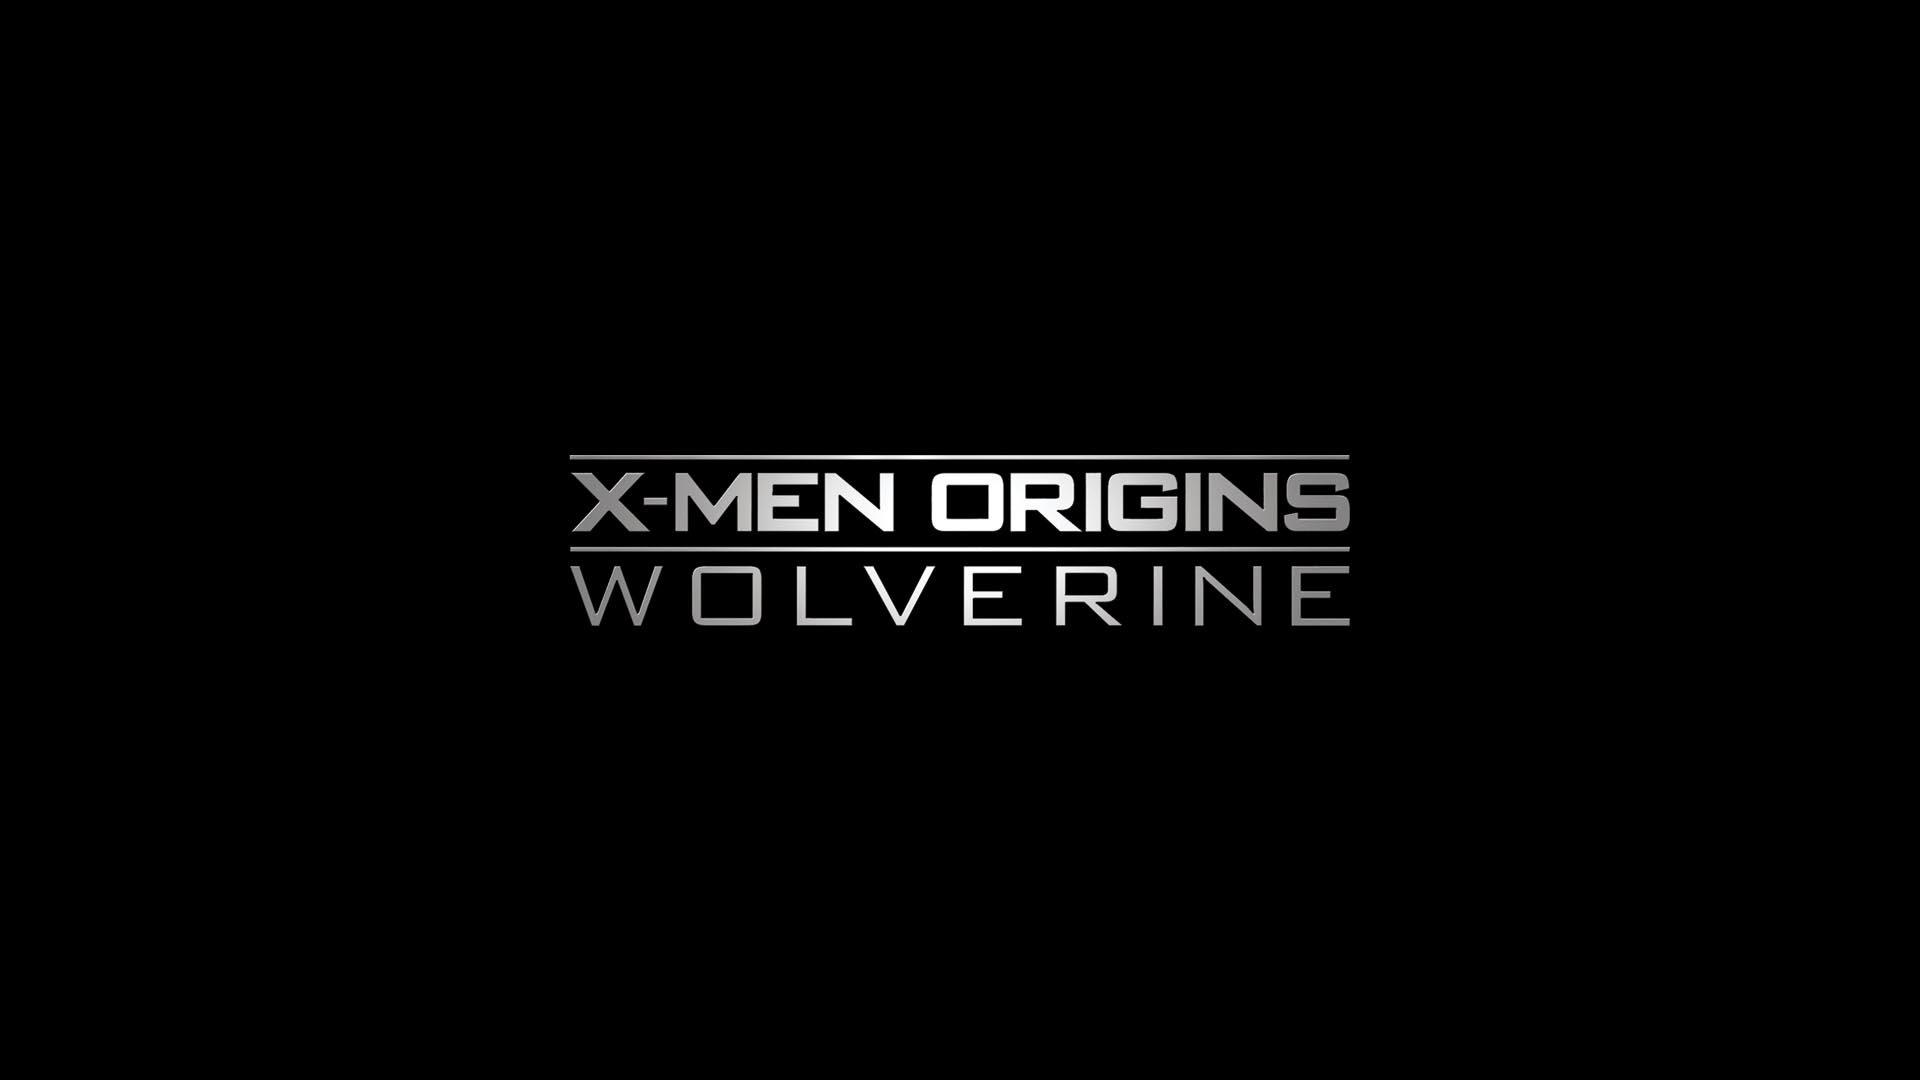 X Men Origins Wolverine Wallpaper 1920x1080